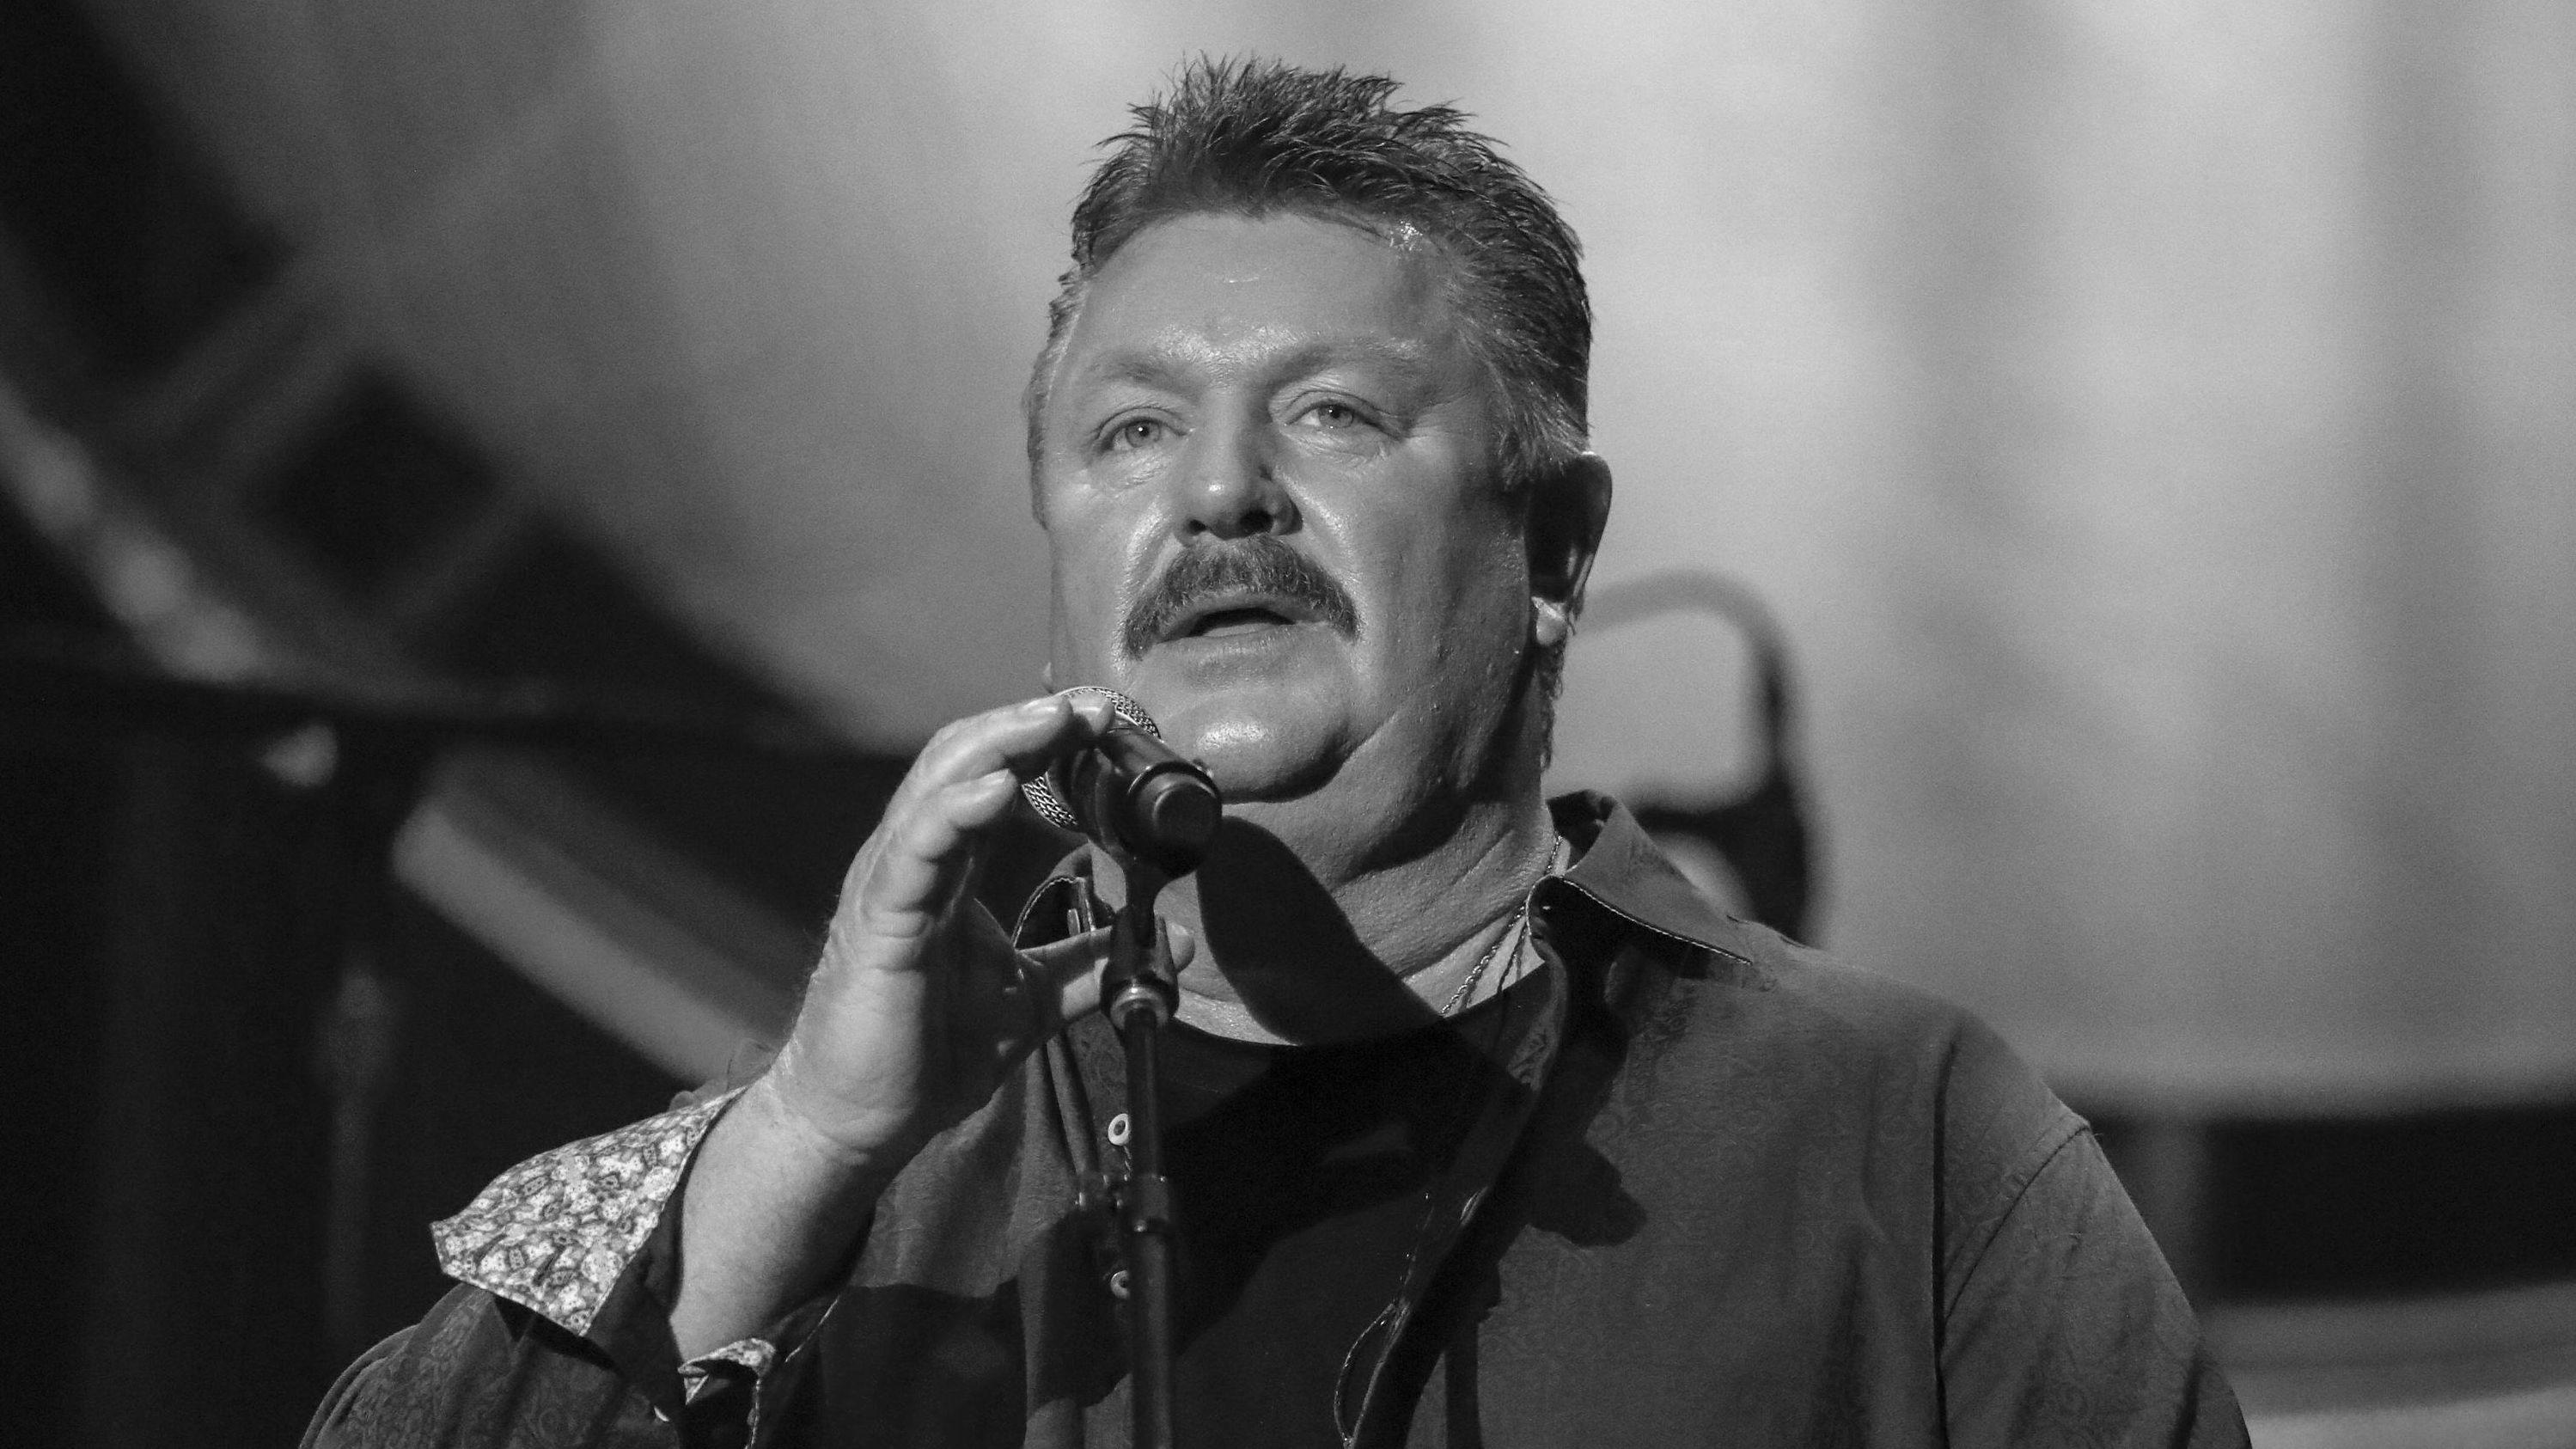 Countrysänger Joe Diffie ist an den Folgen des Coronavirus gestorben.